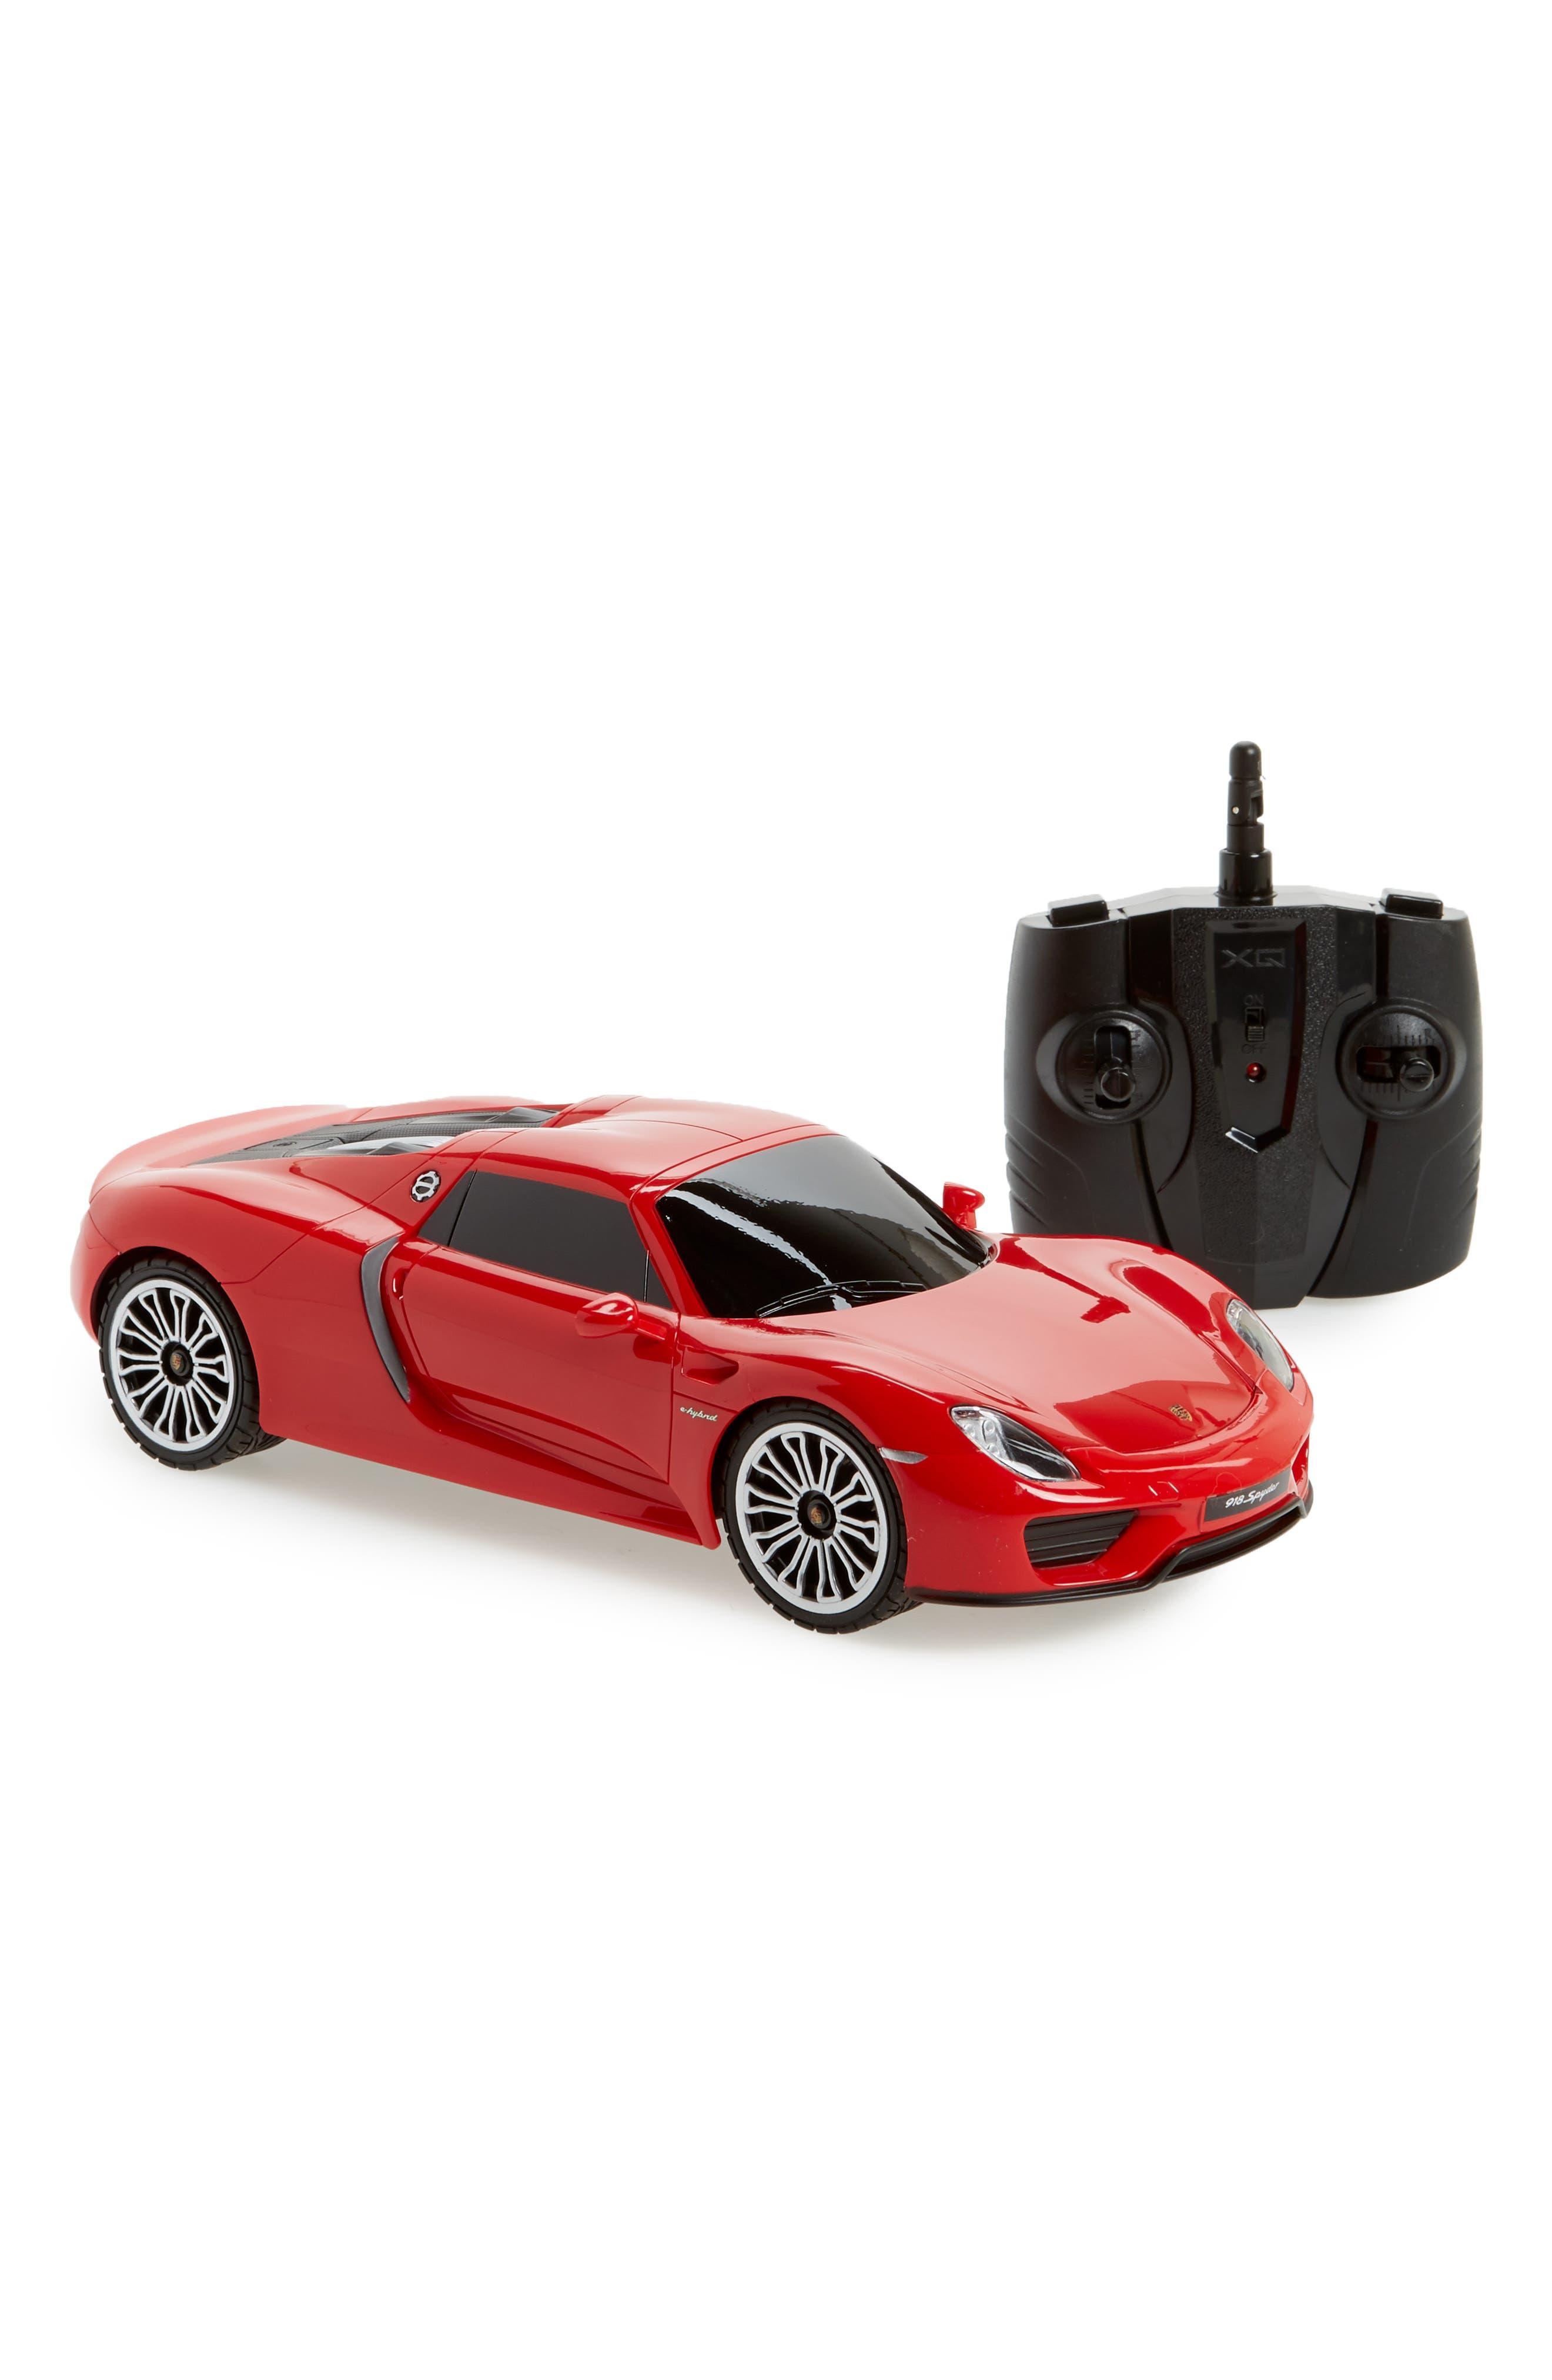 Boys Autotec Porsche Spyder 118 Scale Model Remote Control Car Toy